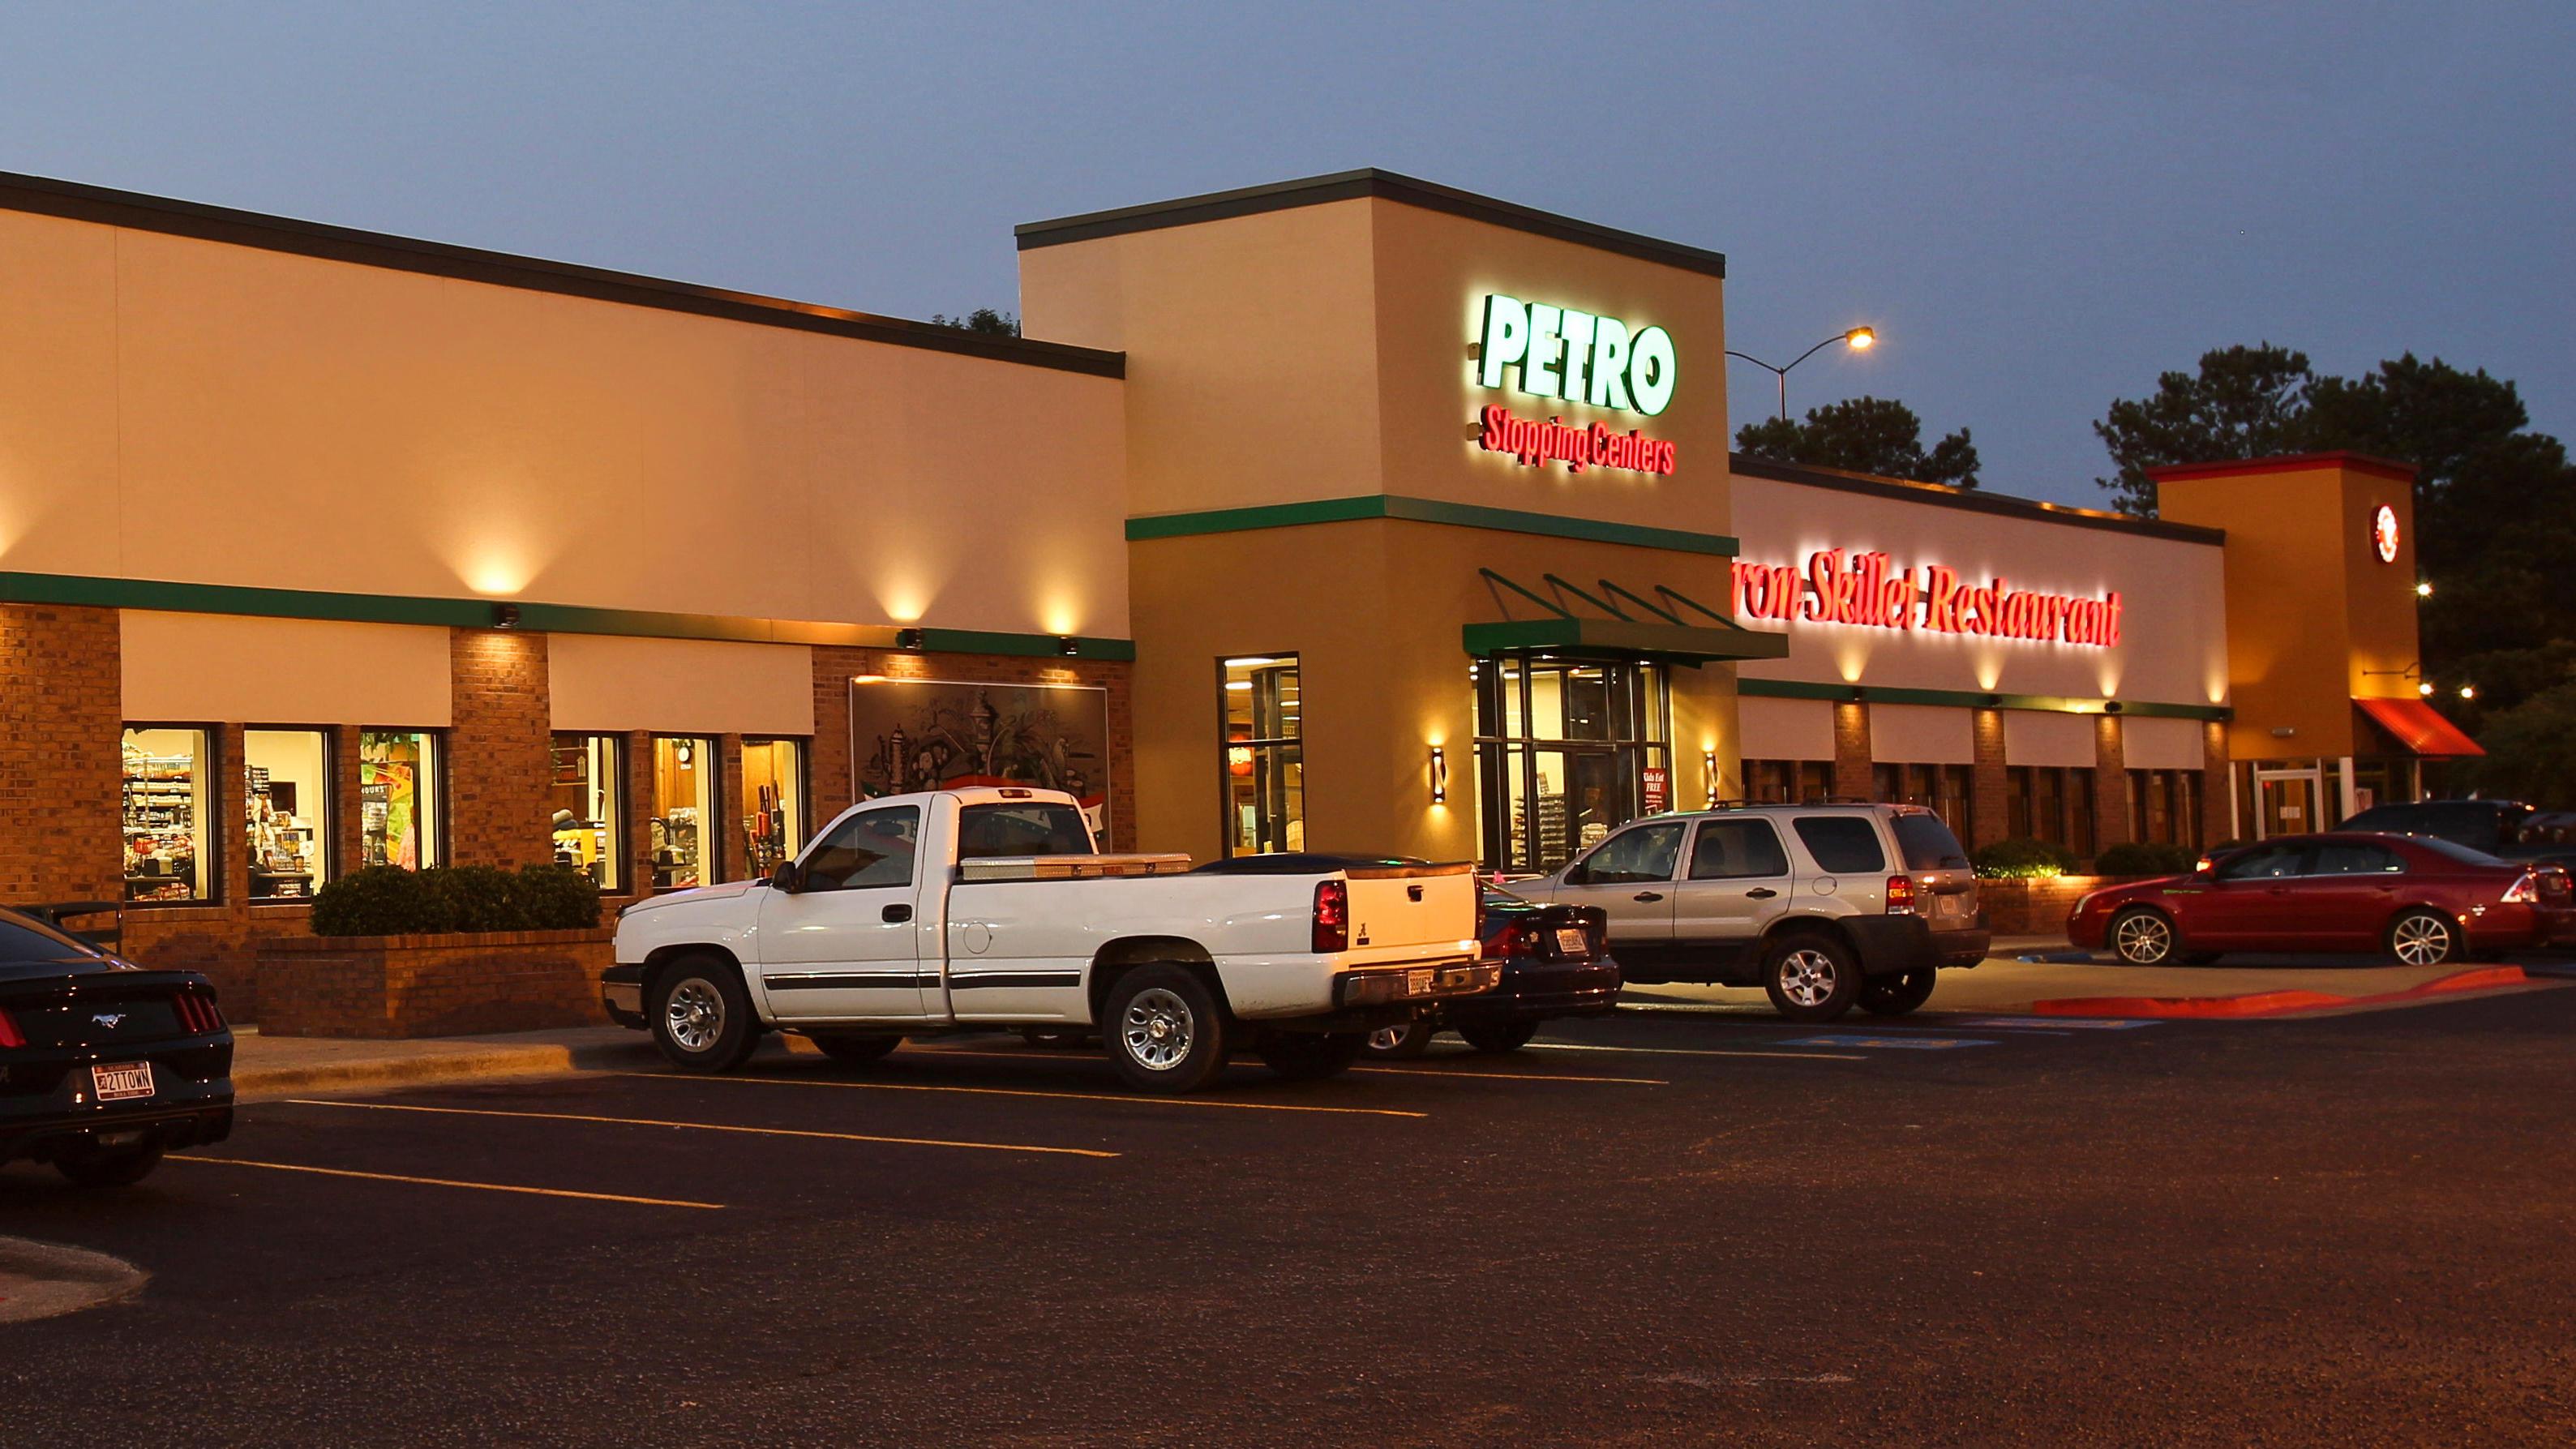 Petro Stopping Center 3900 Petro Dr West Memphis Ar